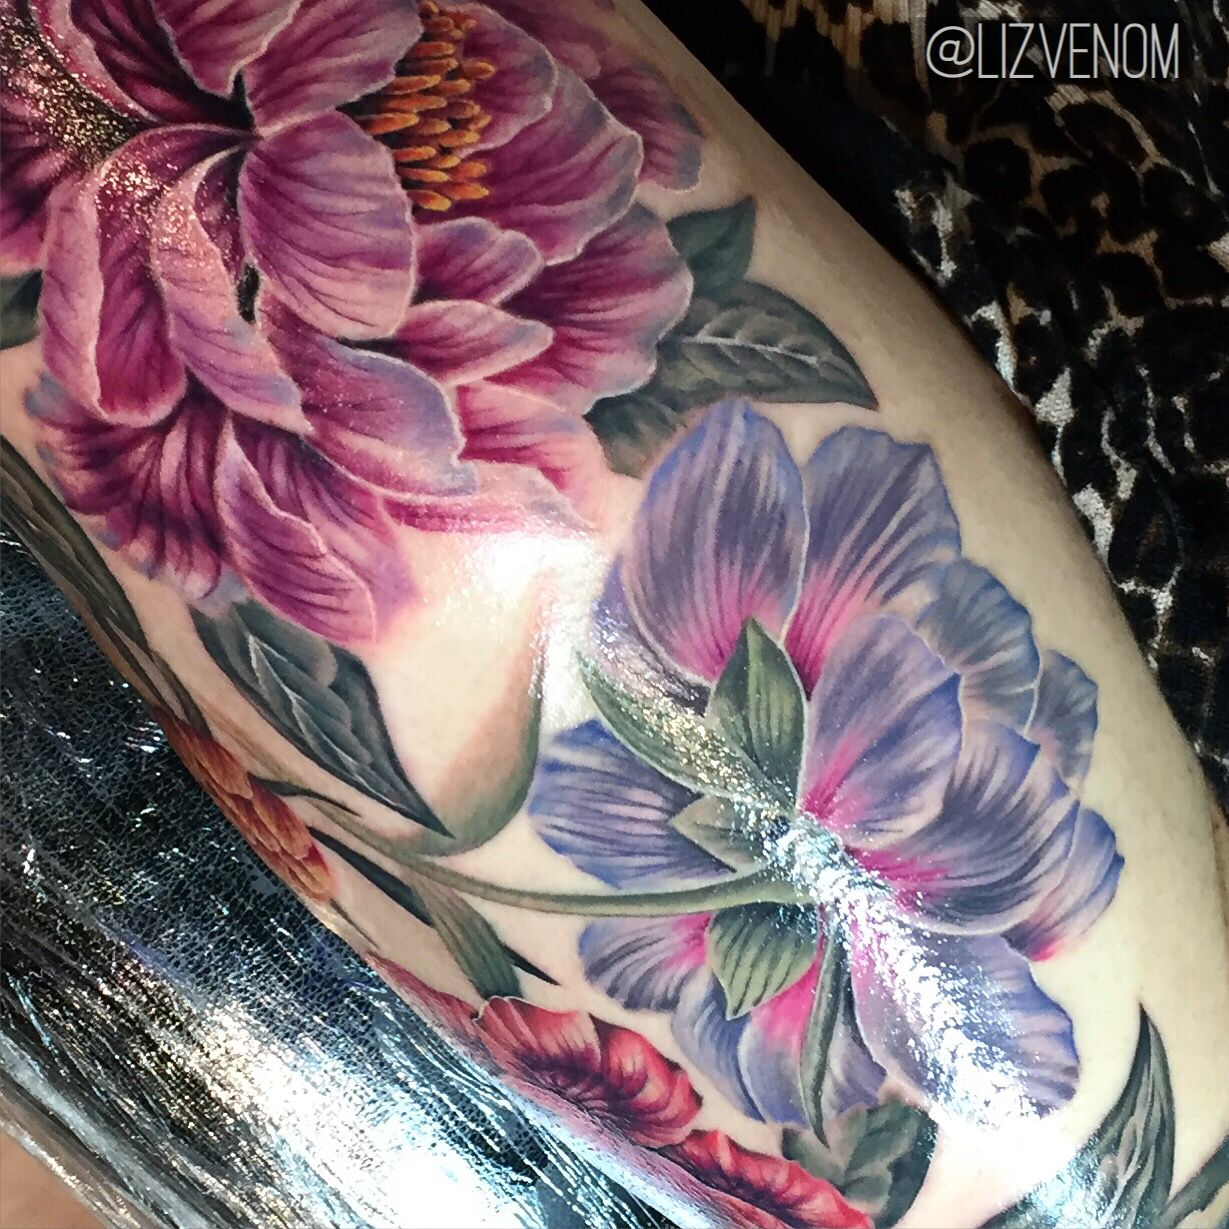 Vintage Venom Tattoo Thoughts: Amazing Vintage Botanical Style Peony Flower Tattoos By